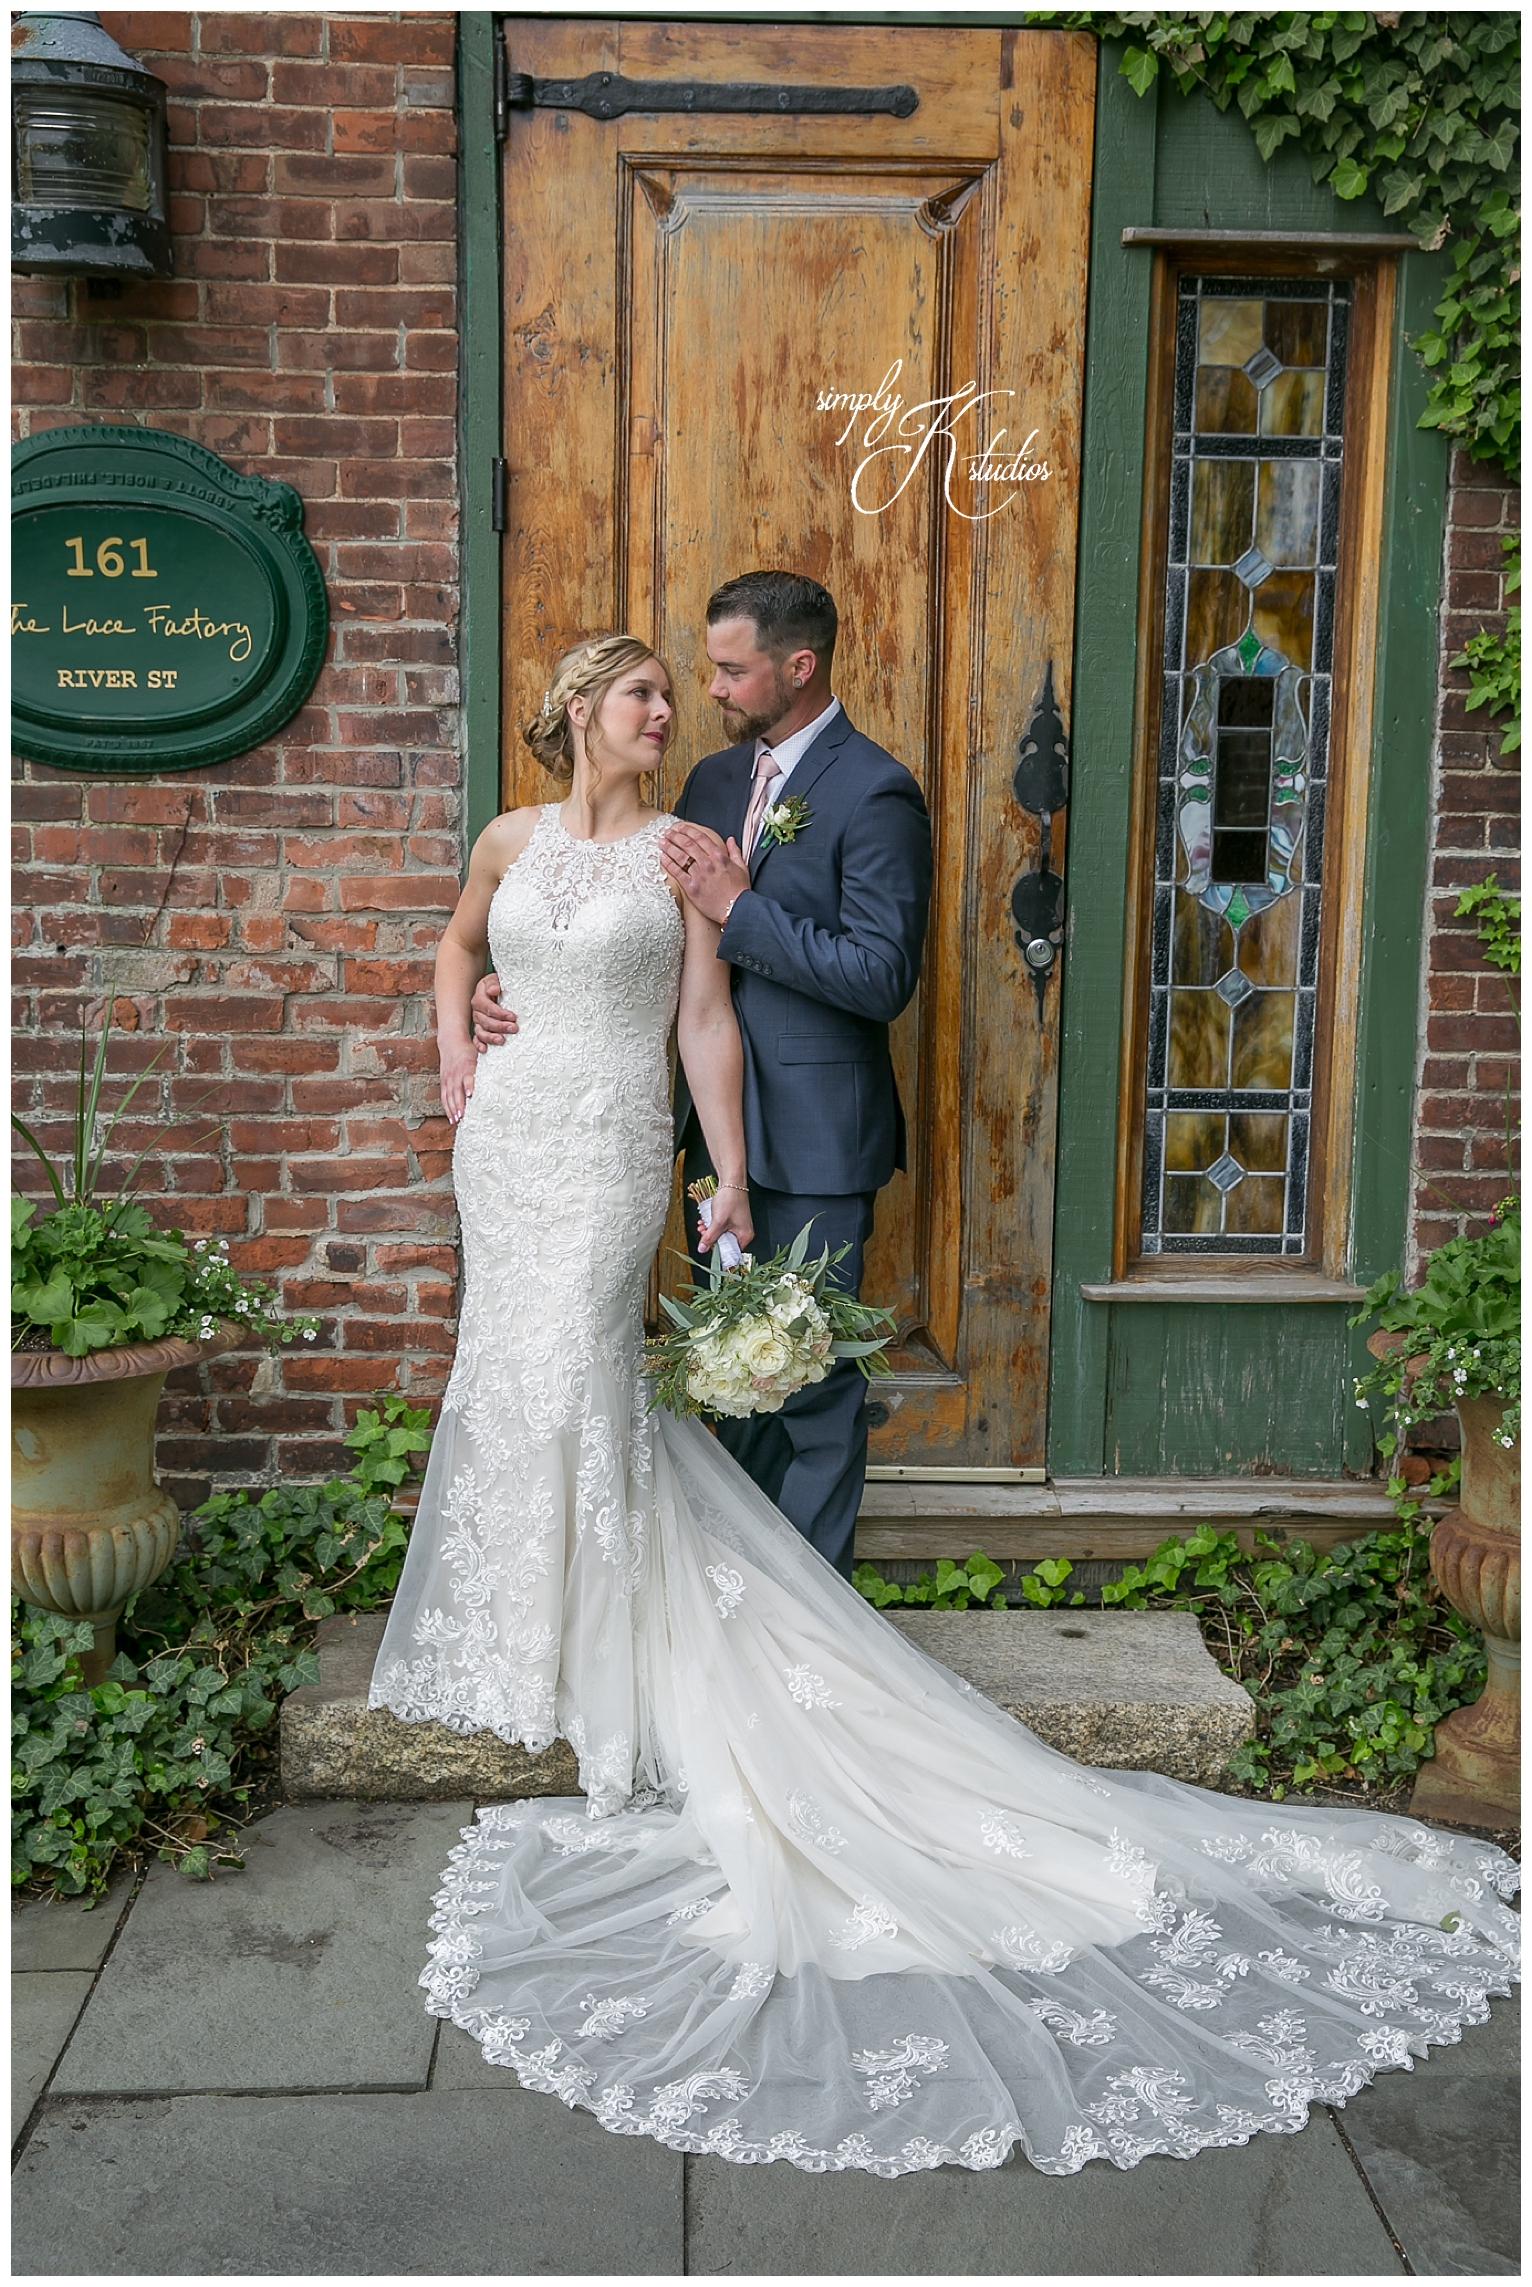 The Lace Factory Wedding Photos.jpg